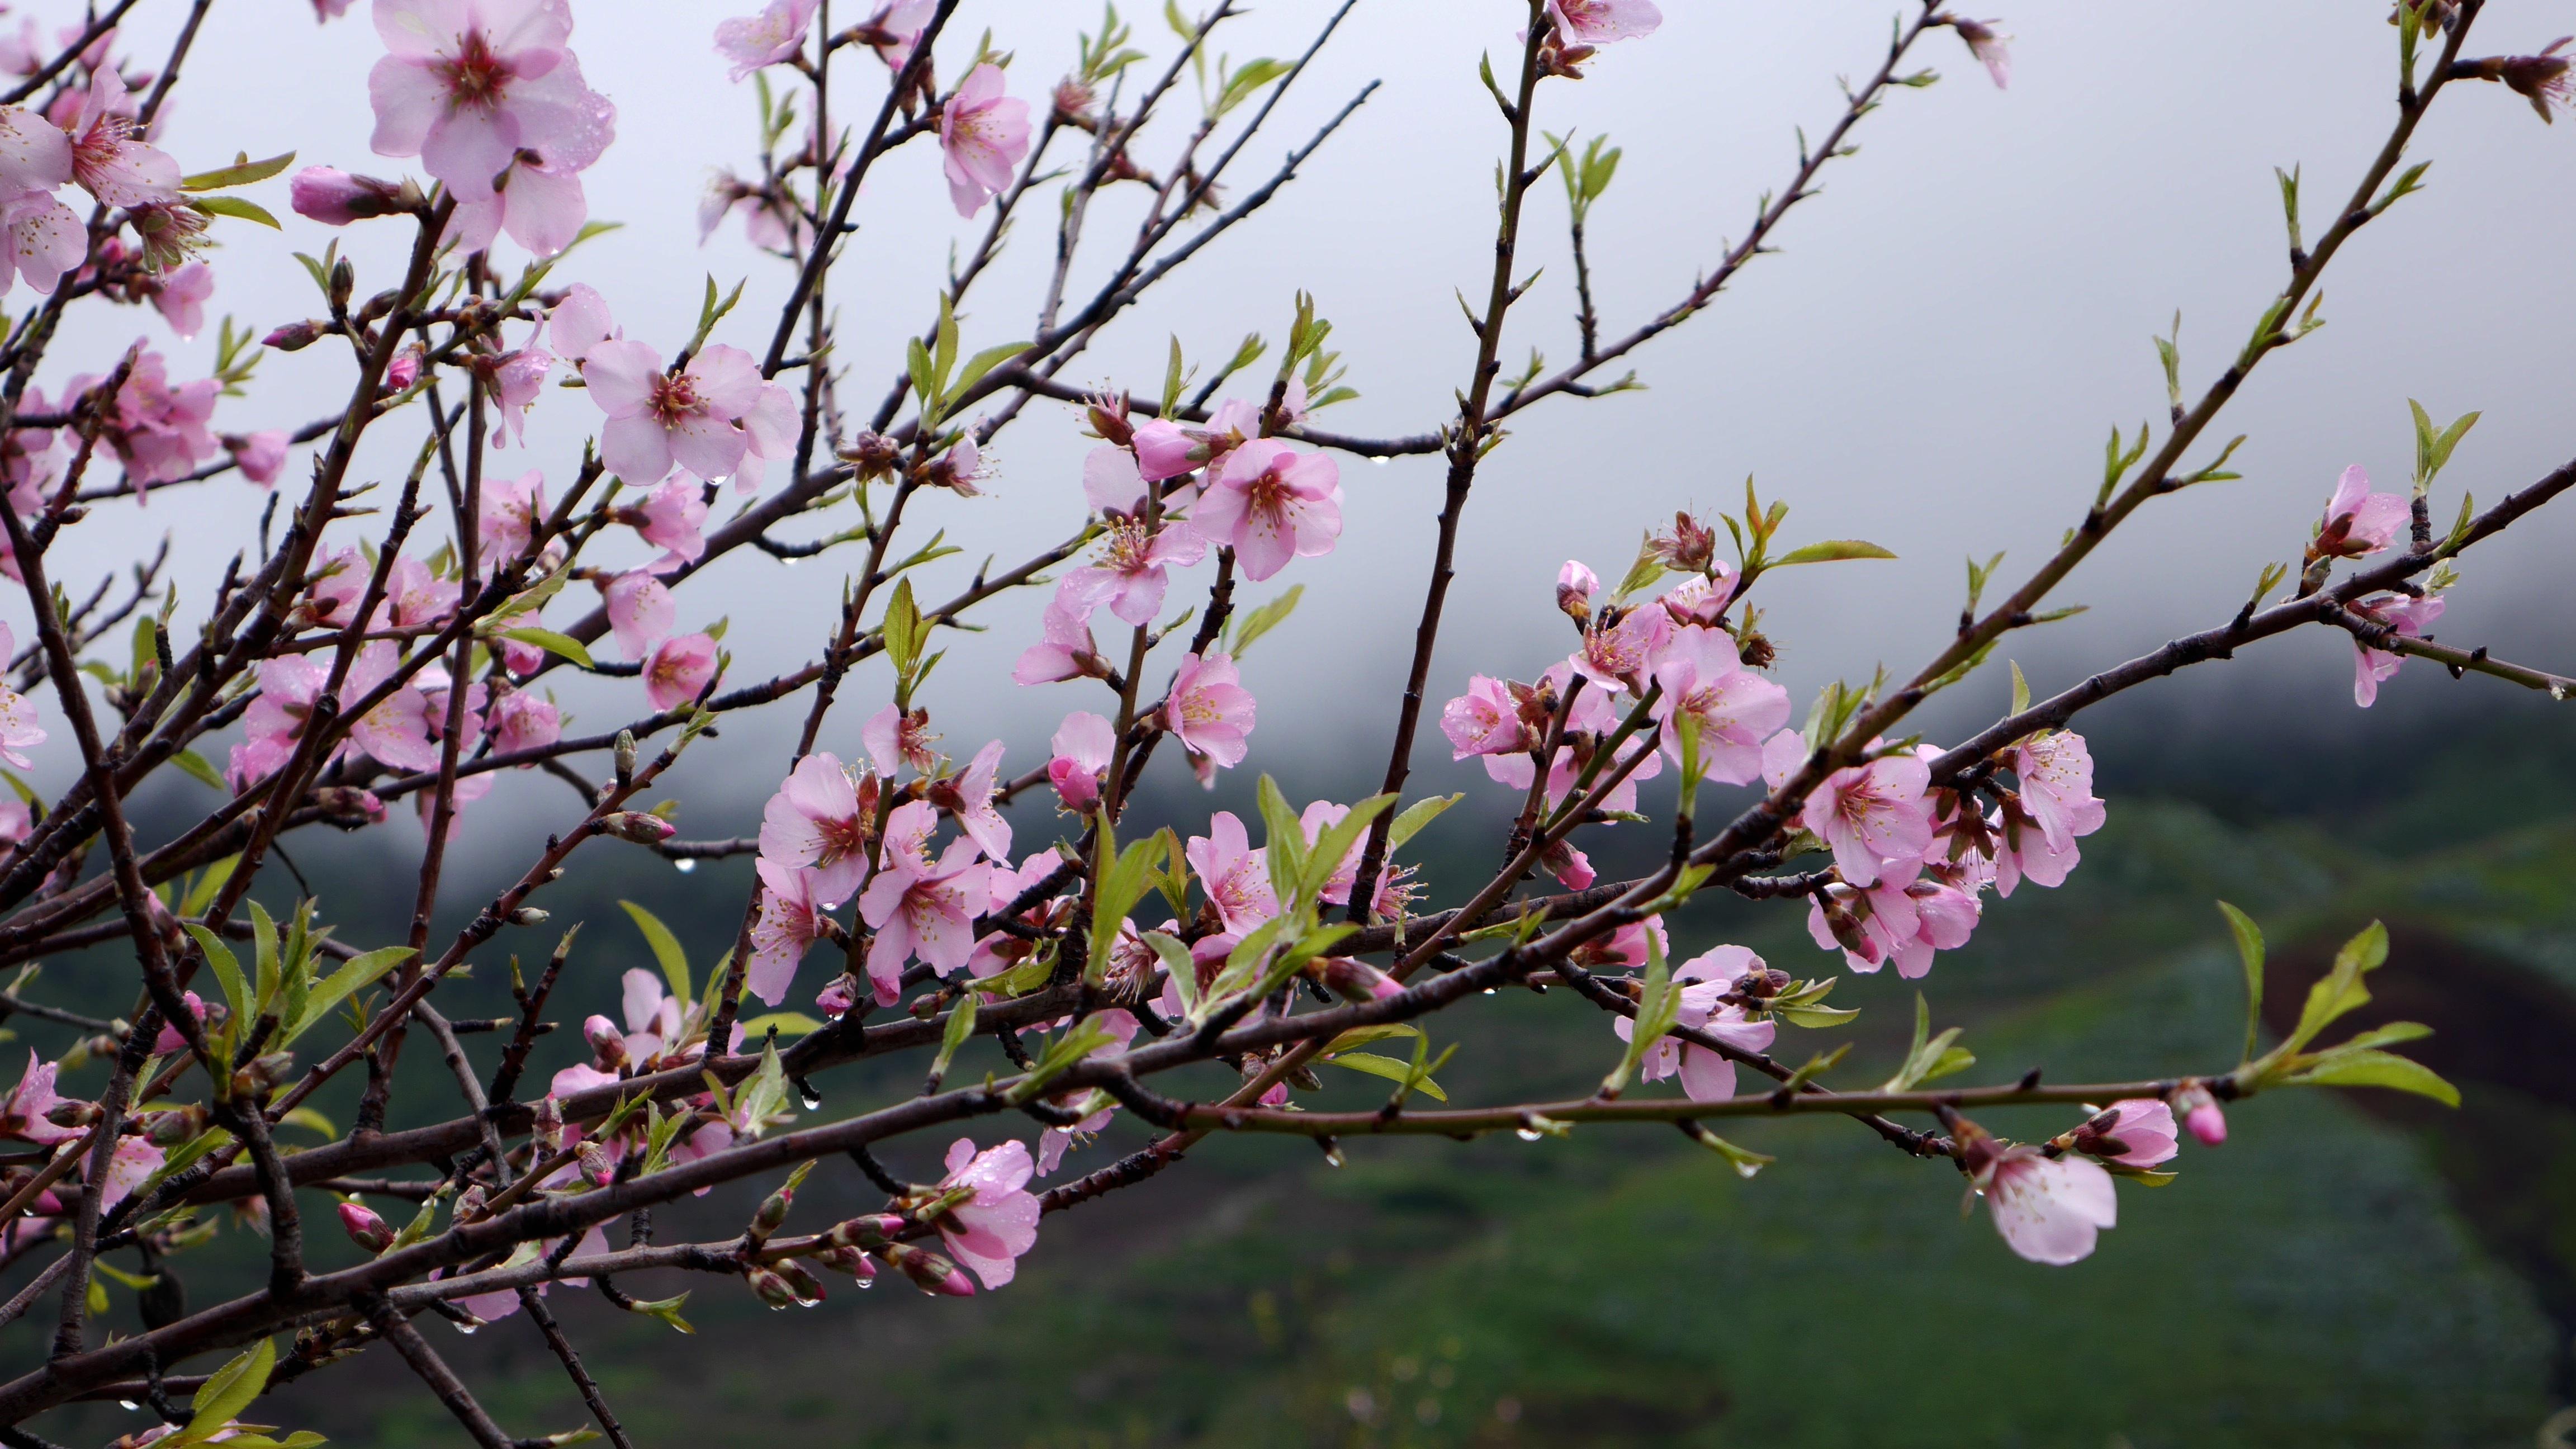 kostenlose foto baum natur ast bl hen winter blume fr hling produzieren botanik rosa. Black Bedroom Furniture Sets. Home Design Ideas